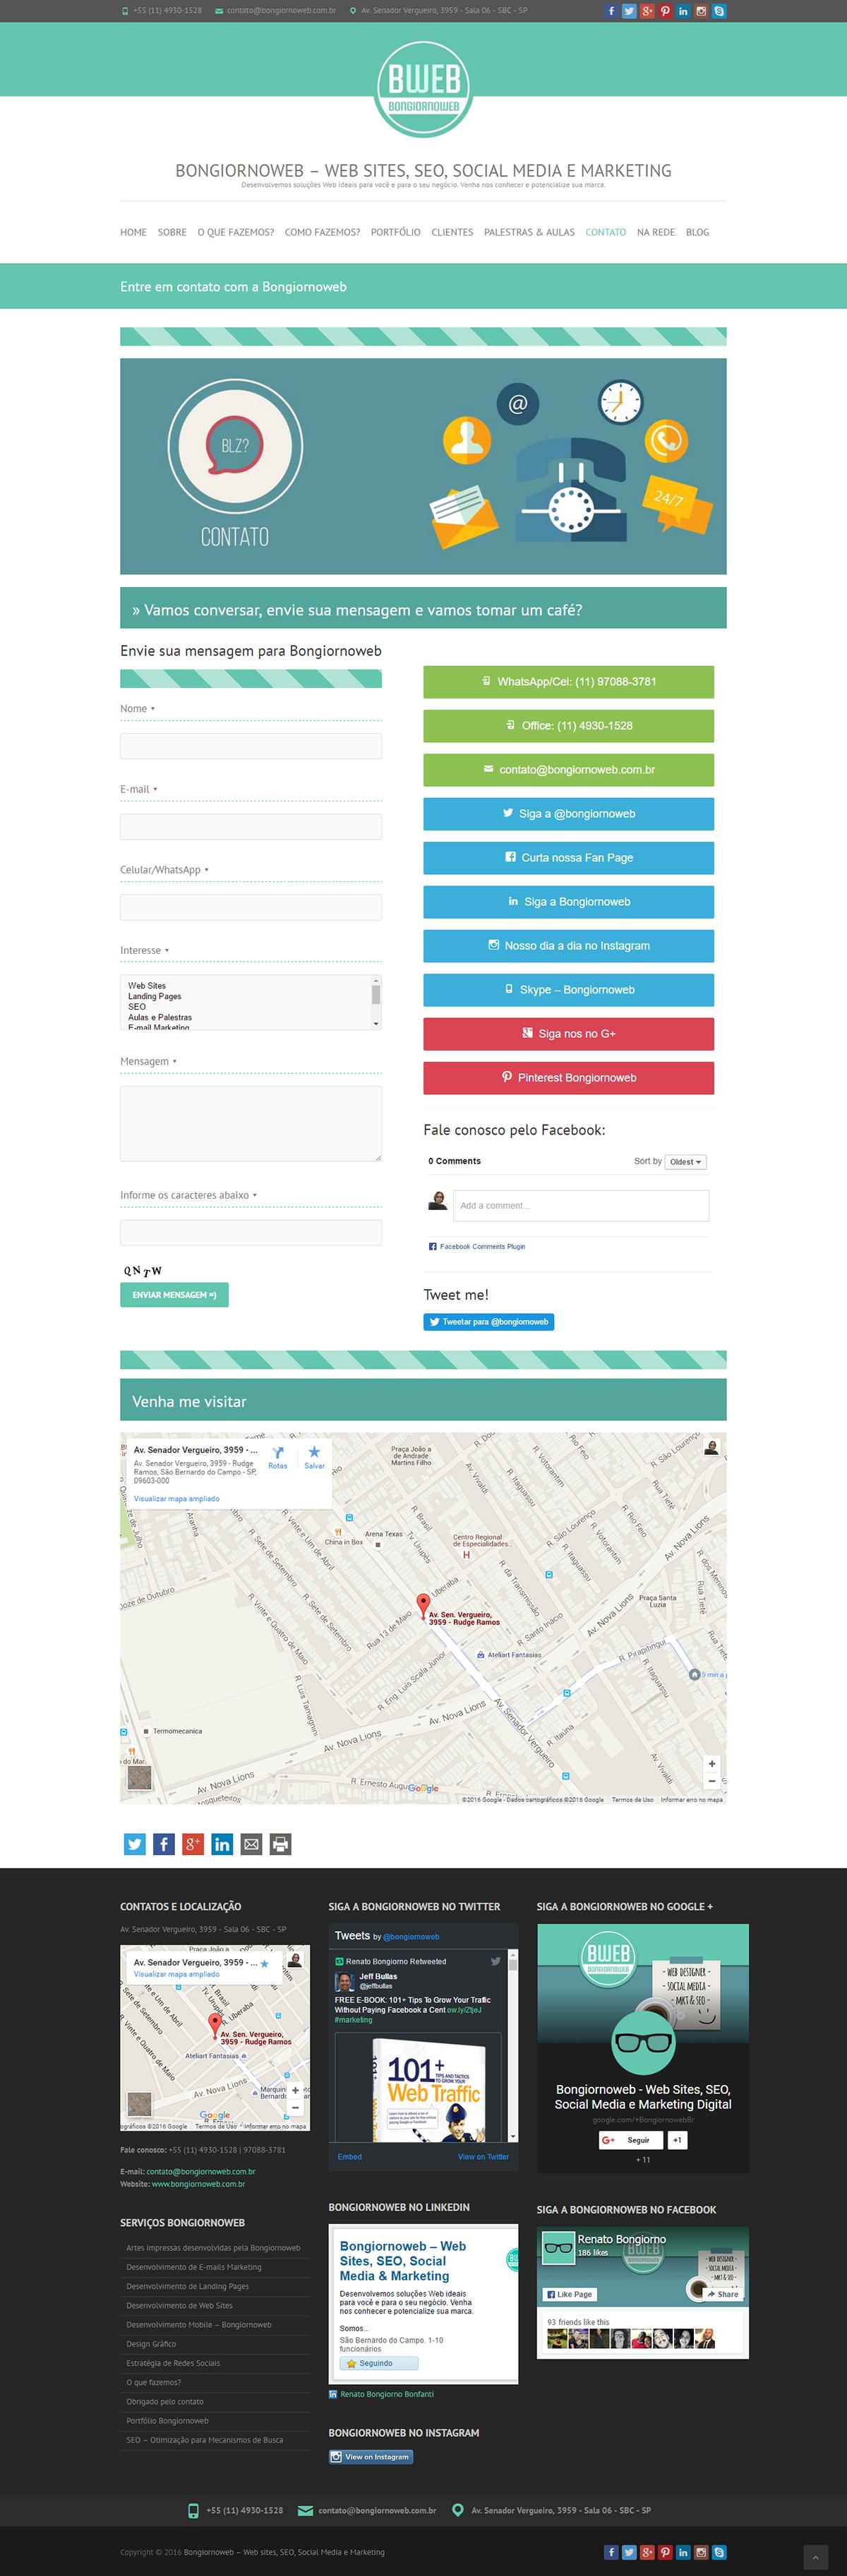 Desenvolvimento do Site - Bongiornoweb